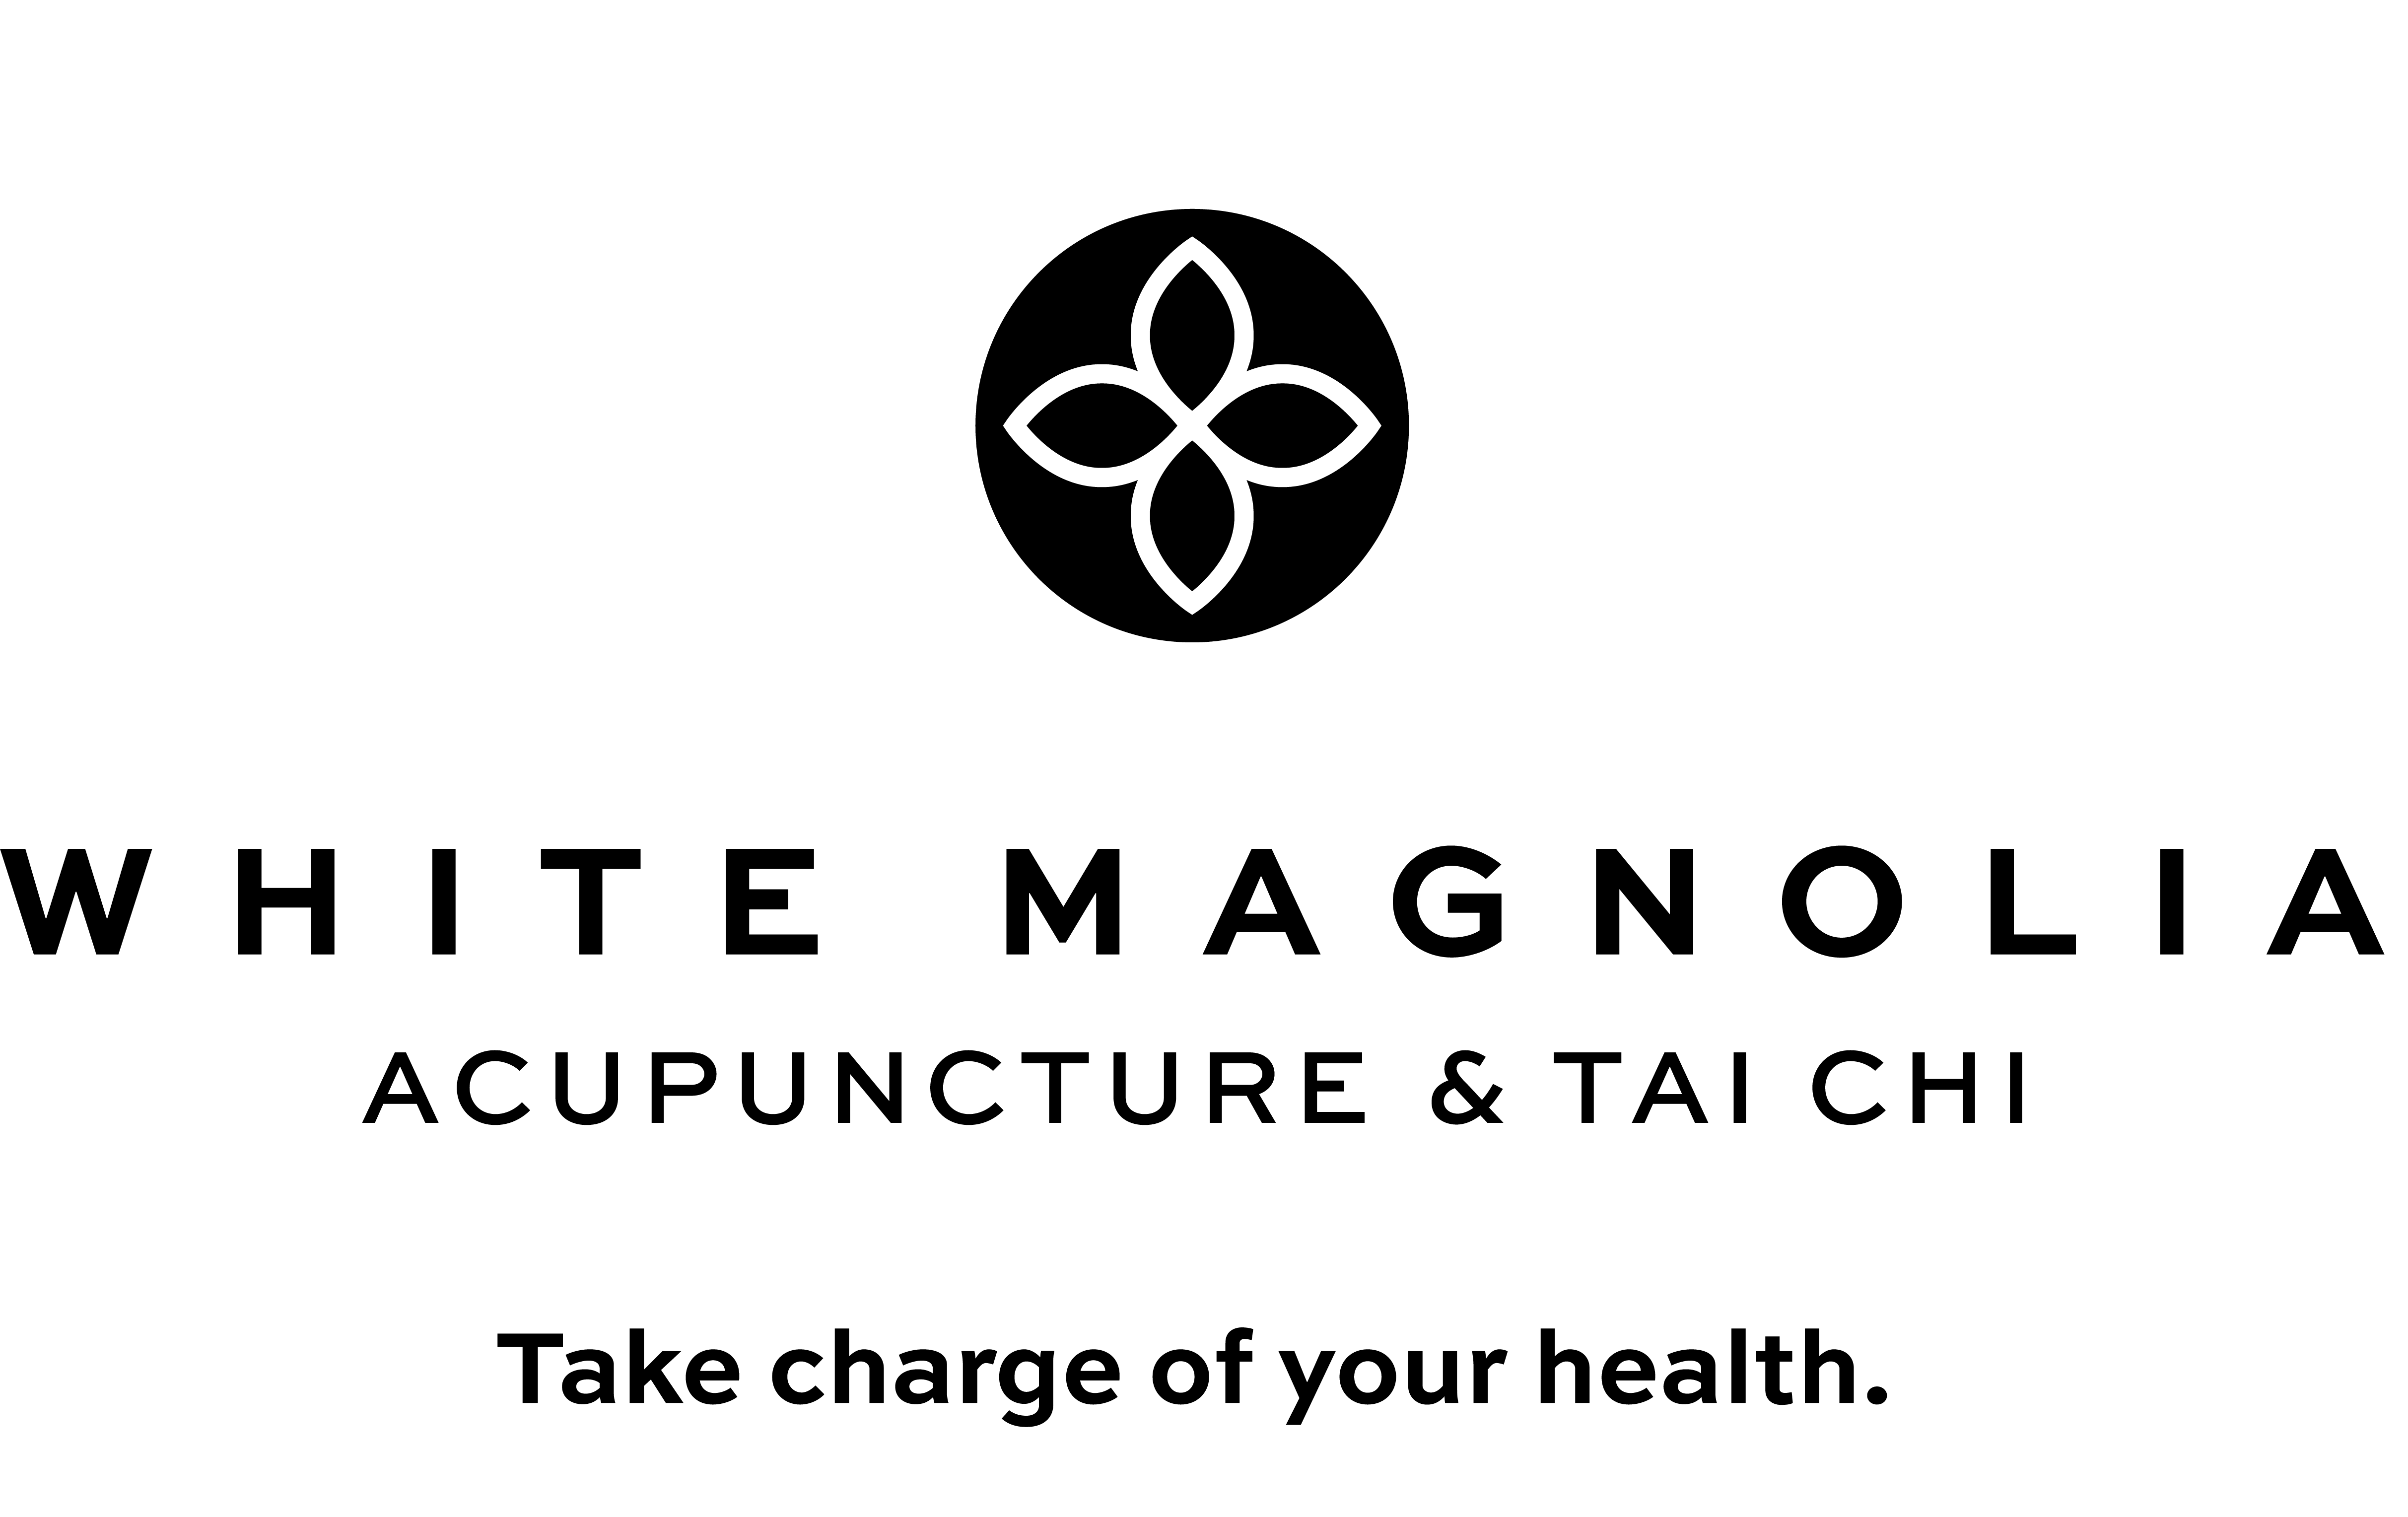 White Magnolia Acupuncture and Tai Chi